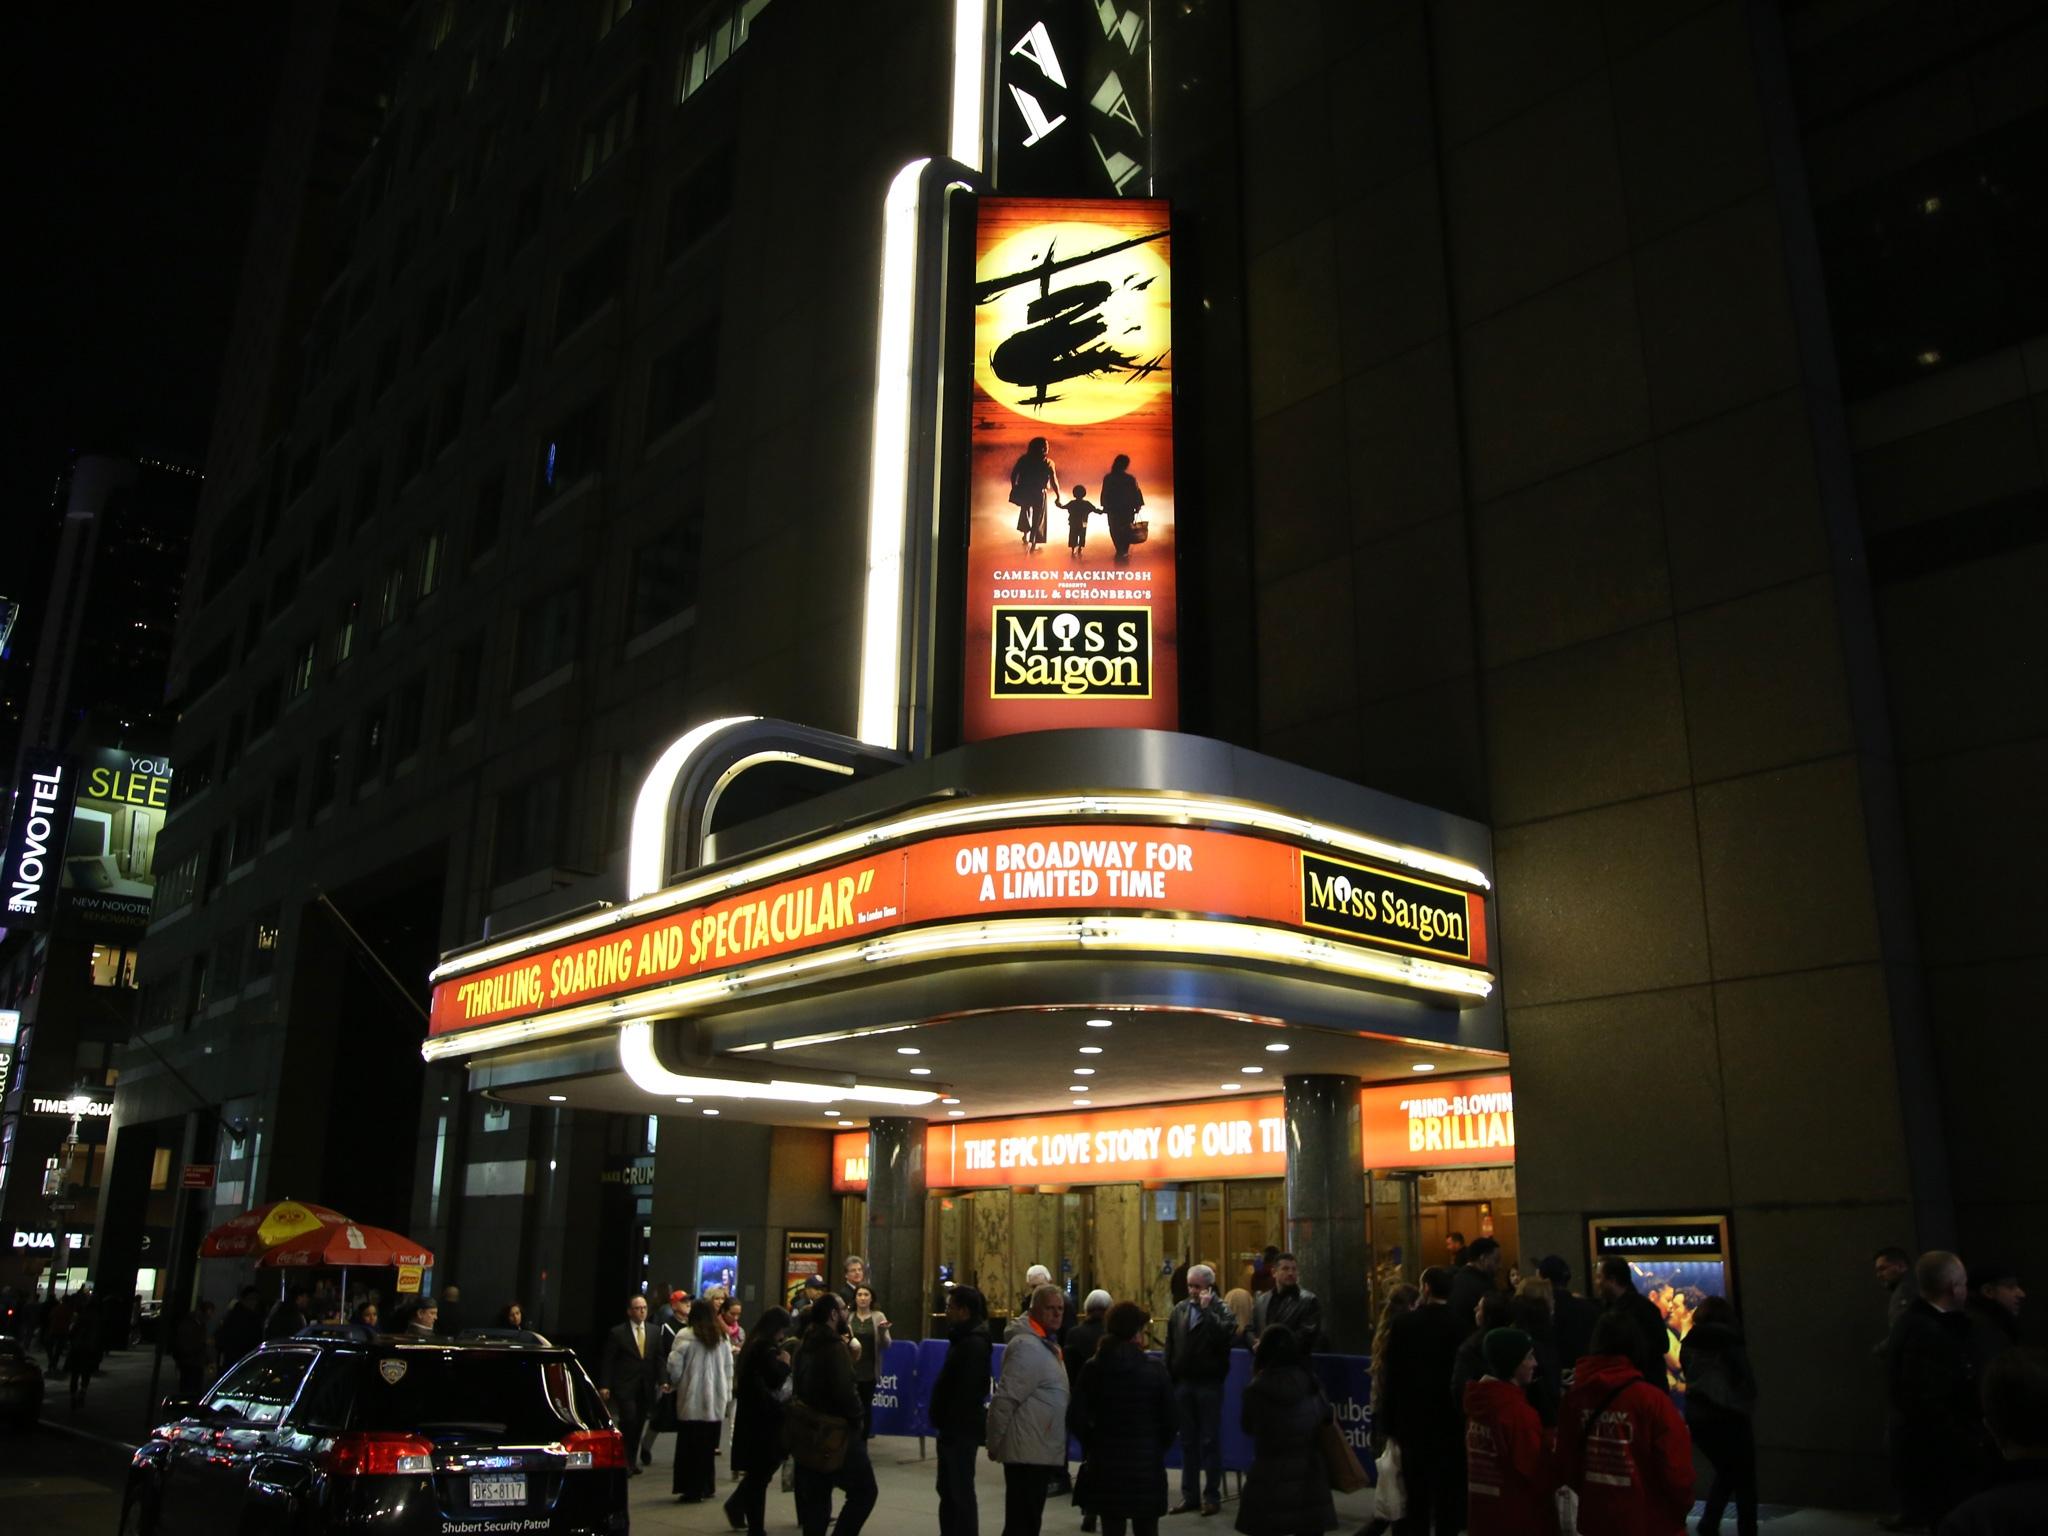 Misssaigon Broadway Theatre Marquee Night Time Shot